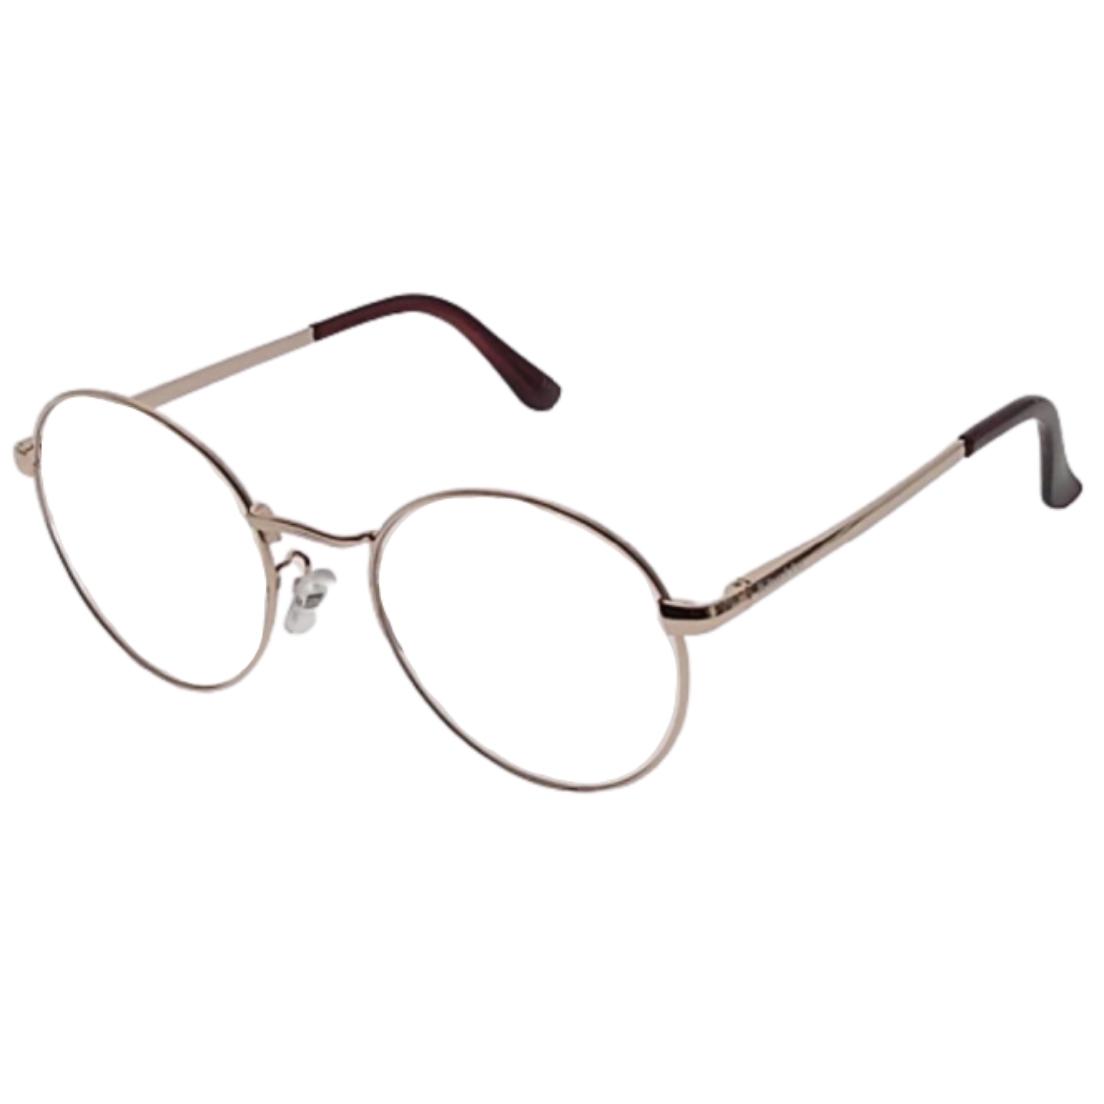 Armação de Óculos Khatto Round Vintage - C143